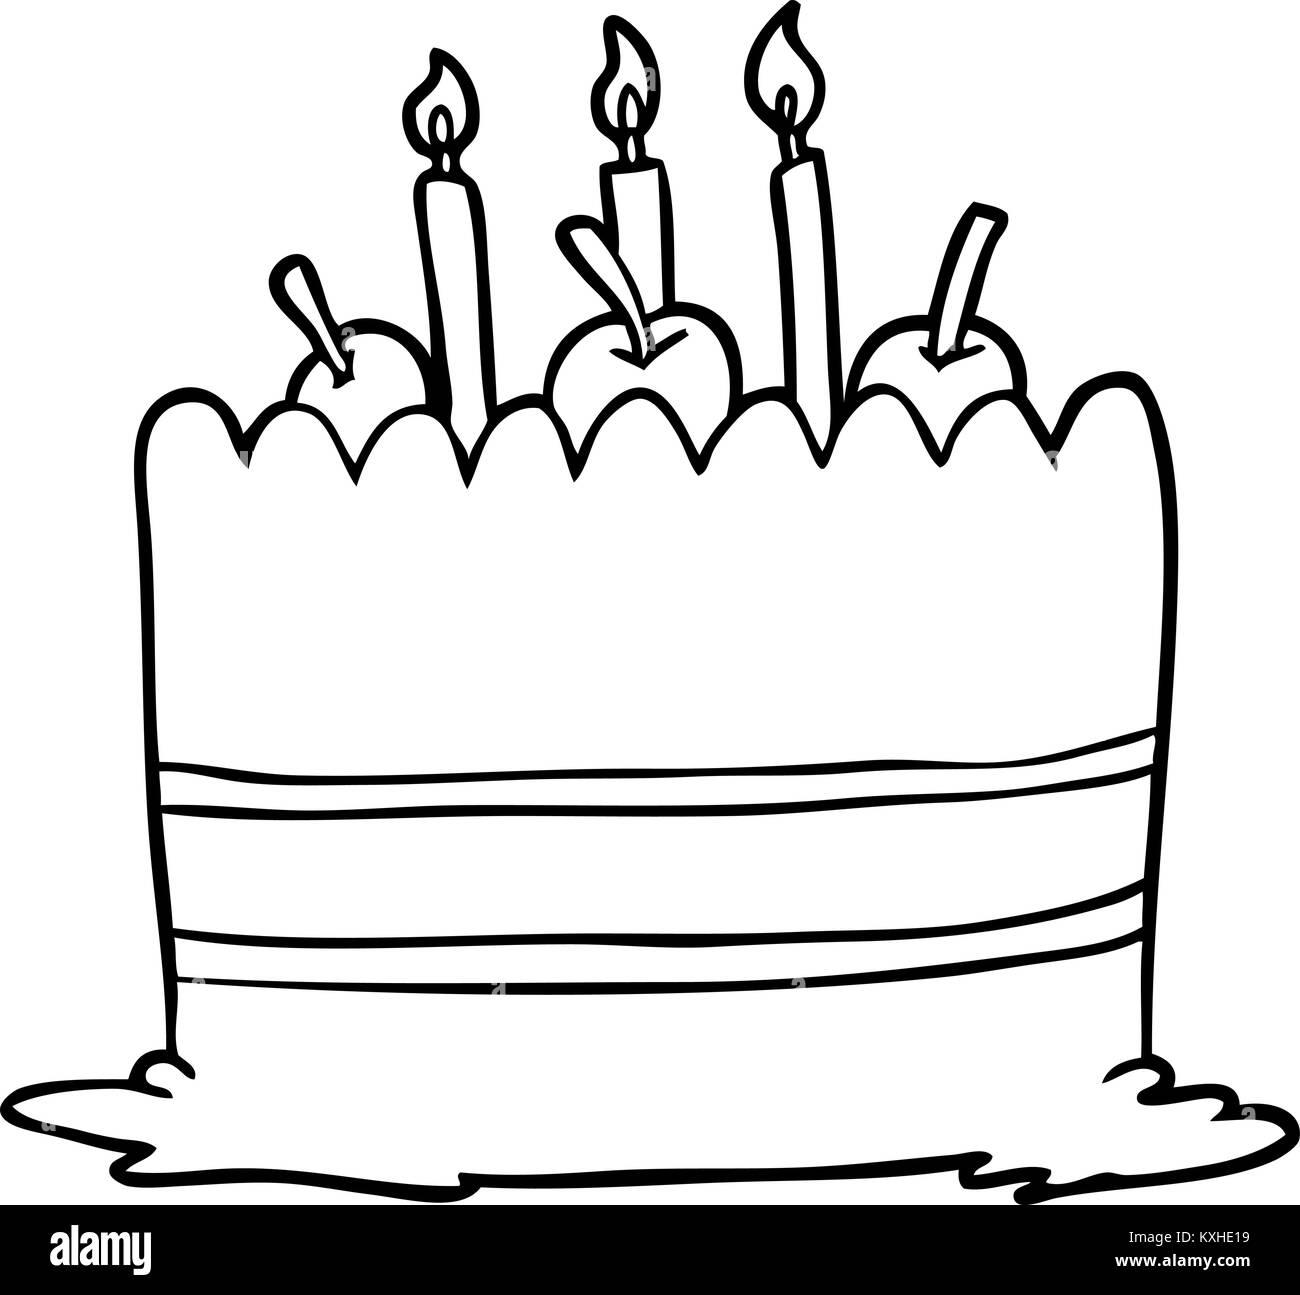 Remarkable Line Drawing Of A Birthday Cake Stock Vector Art Illustration Personalised Birthday Cards Vishlily Jamesorg